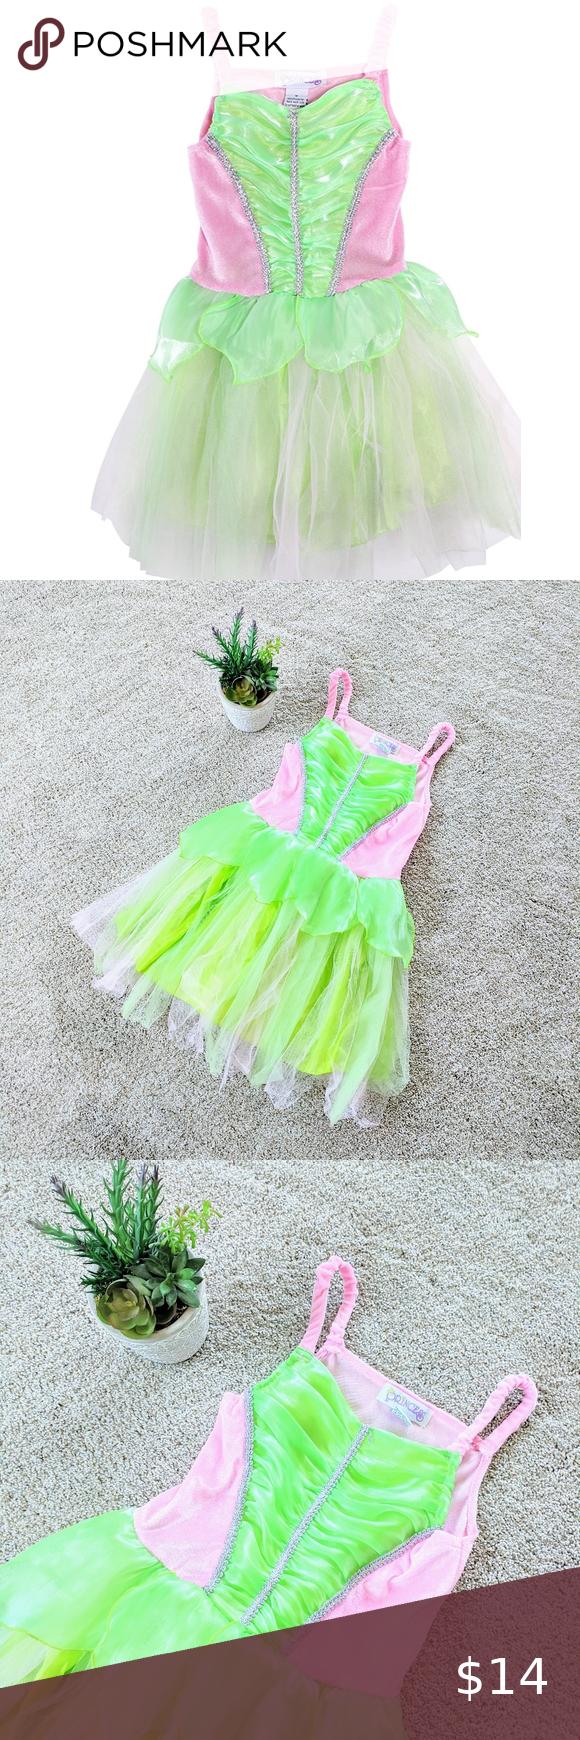 Green Tinkerbell Costume Dress Tinker Bell Costume Costume Dress Princess Costumes [ 1740 x 580 Pixel ]